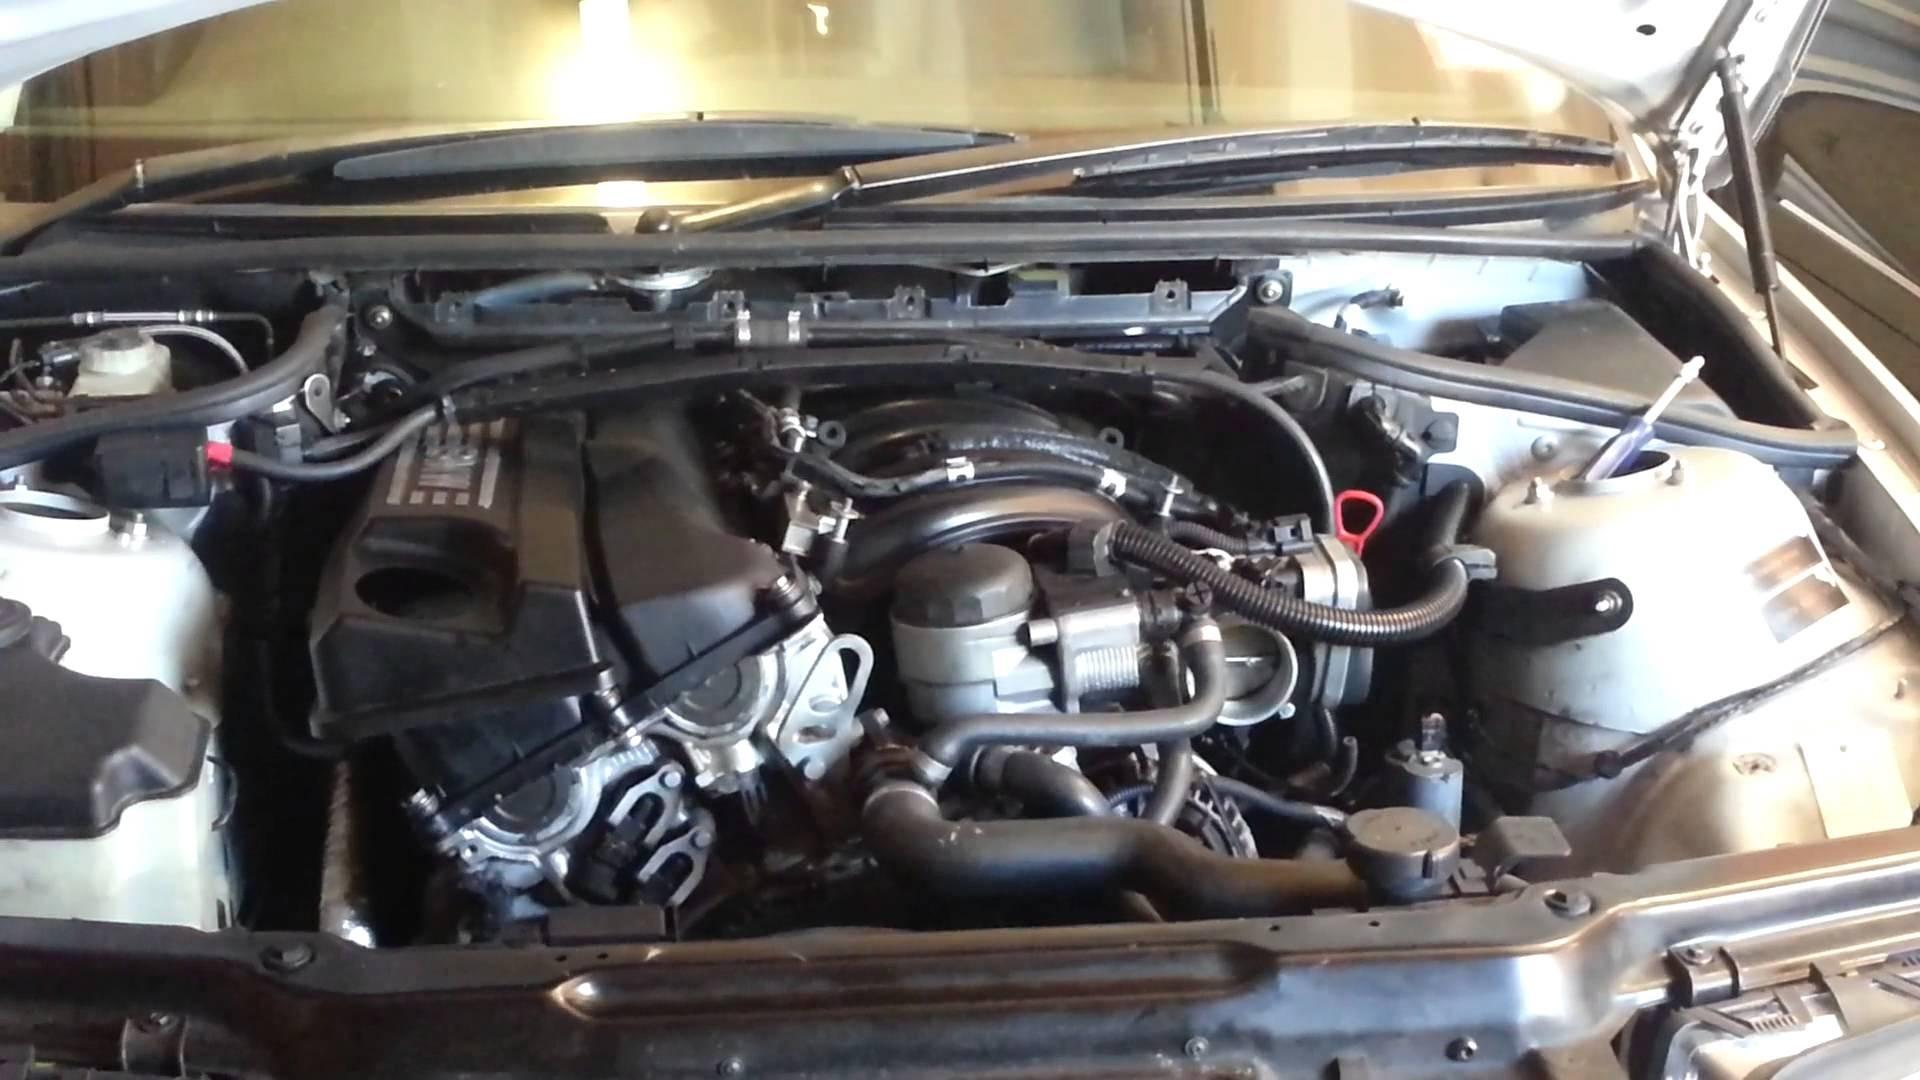 Bmw 318ti Engine Diagram Replace Oil Separator Crankcase Ventilator Ccv On Bmw E46 N42 Of Bmw 318ti Engine Diagram